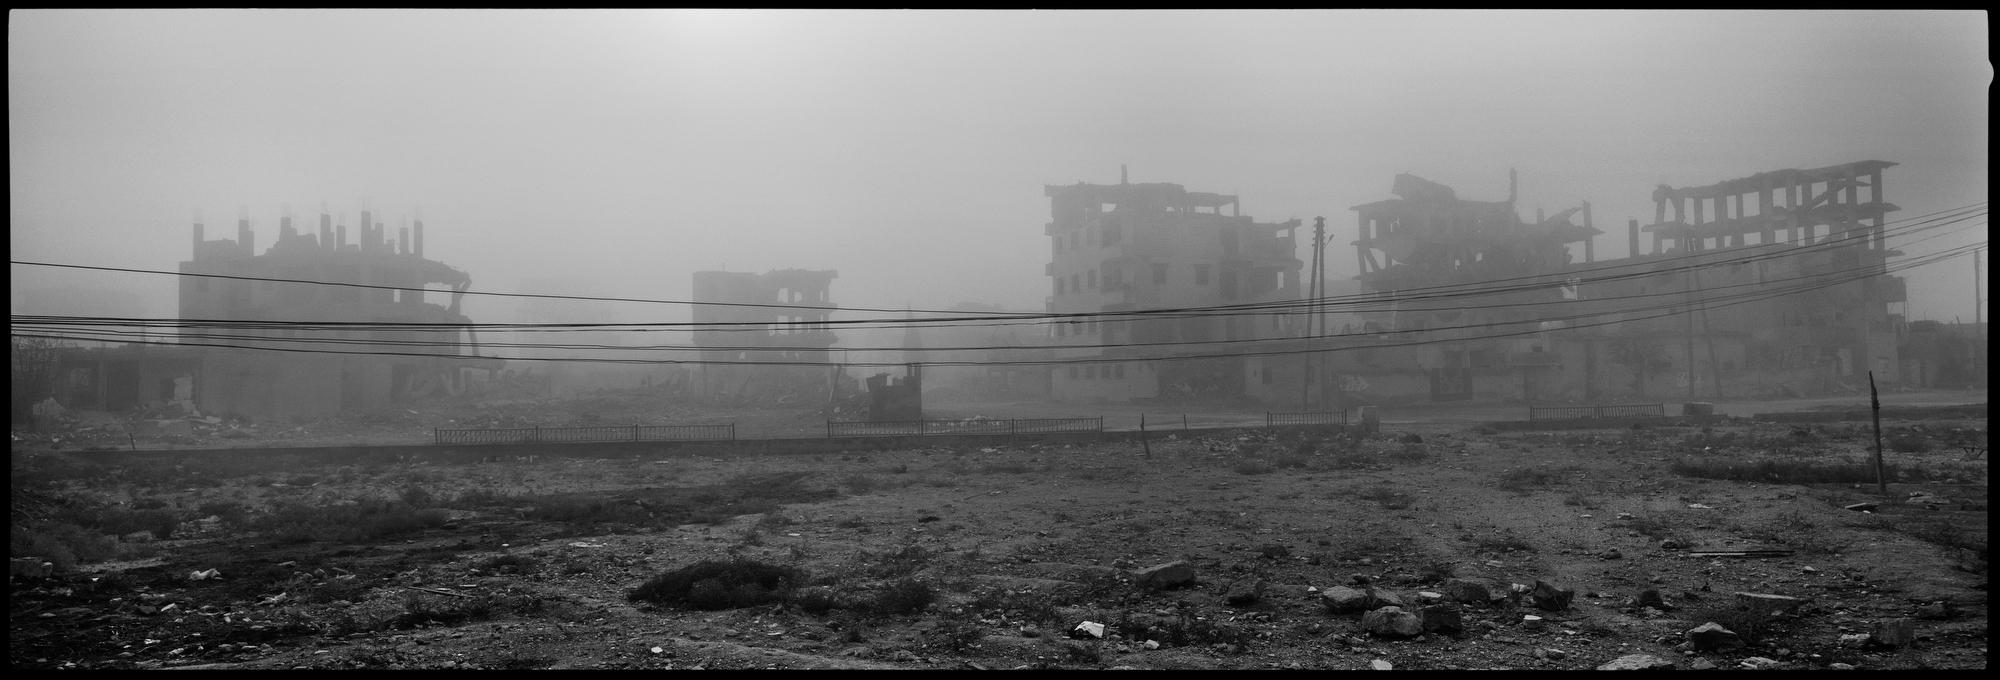 Raqqa, Syria. November, 2018.